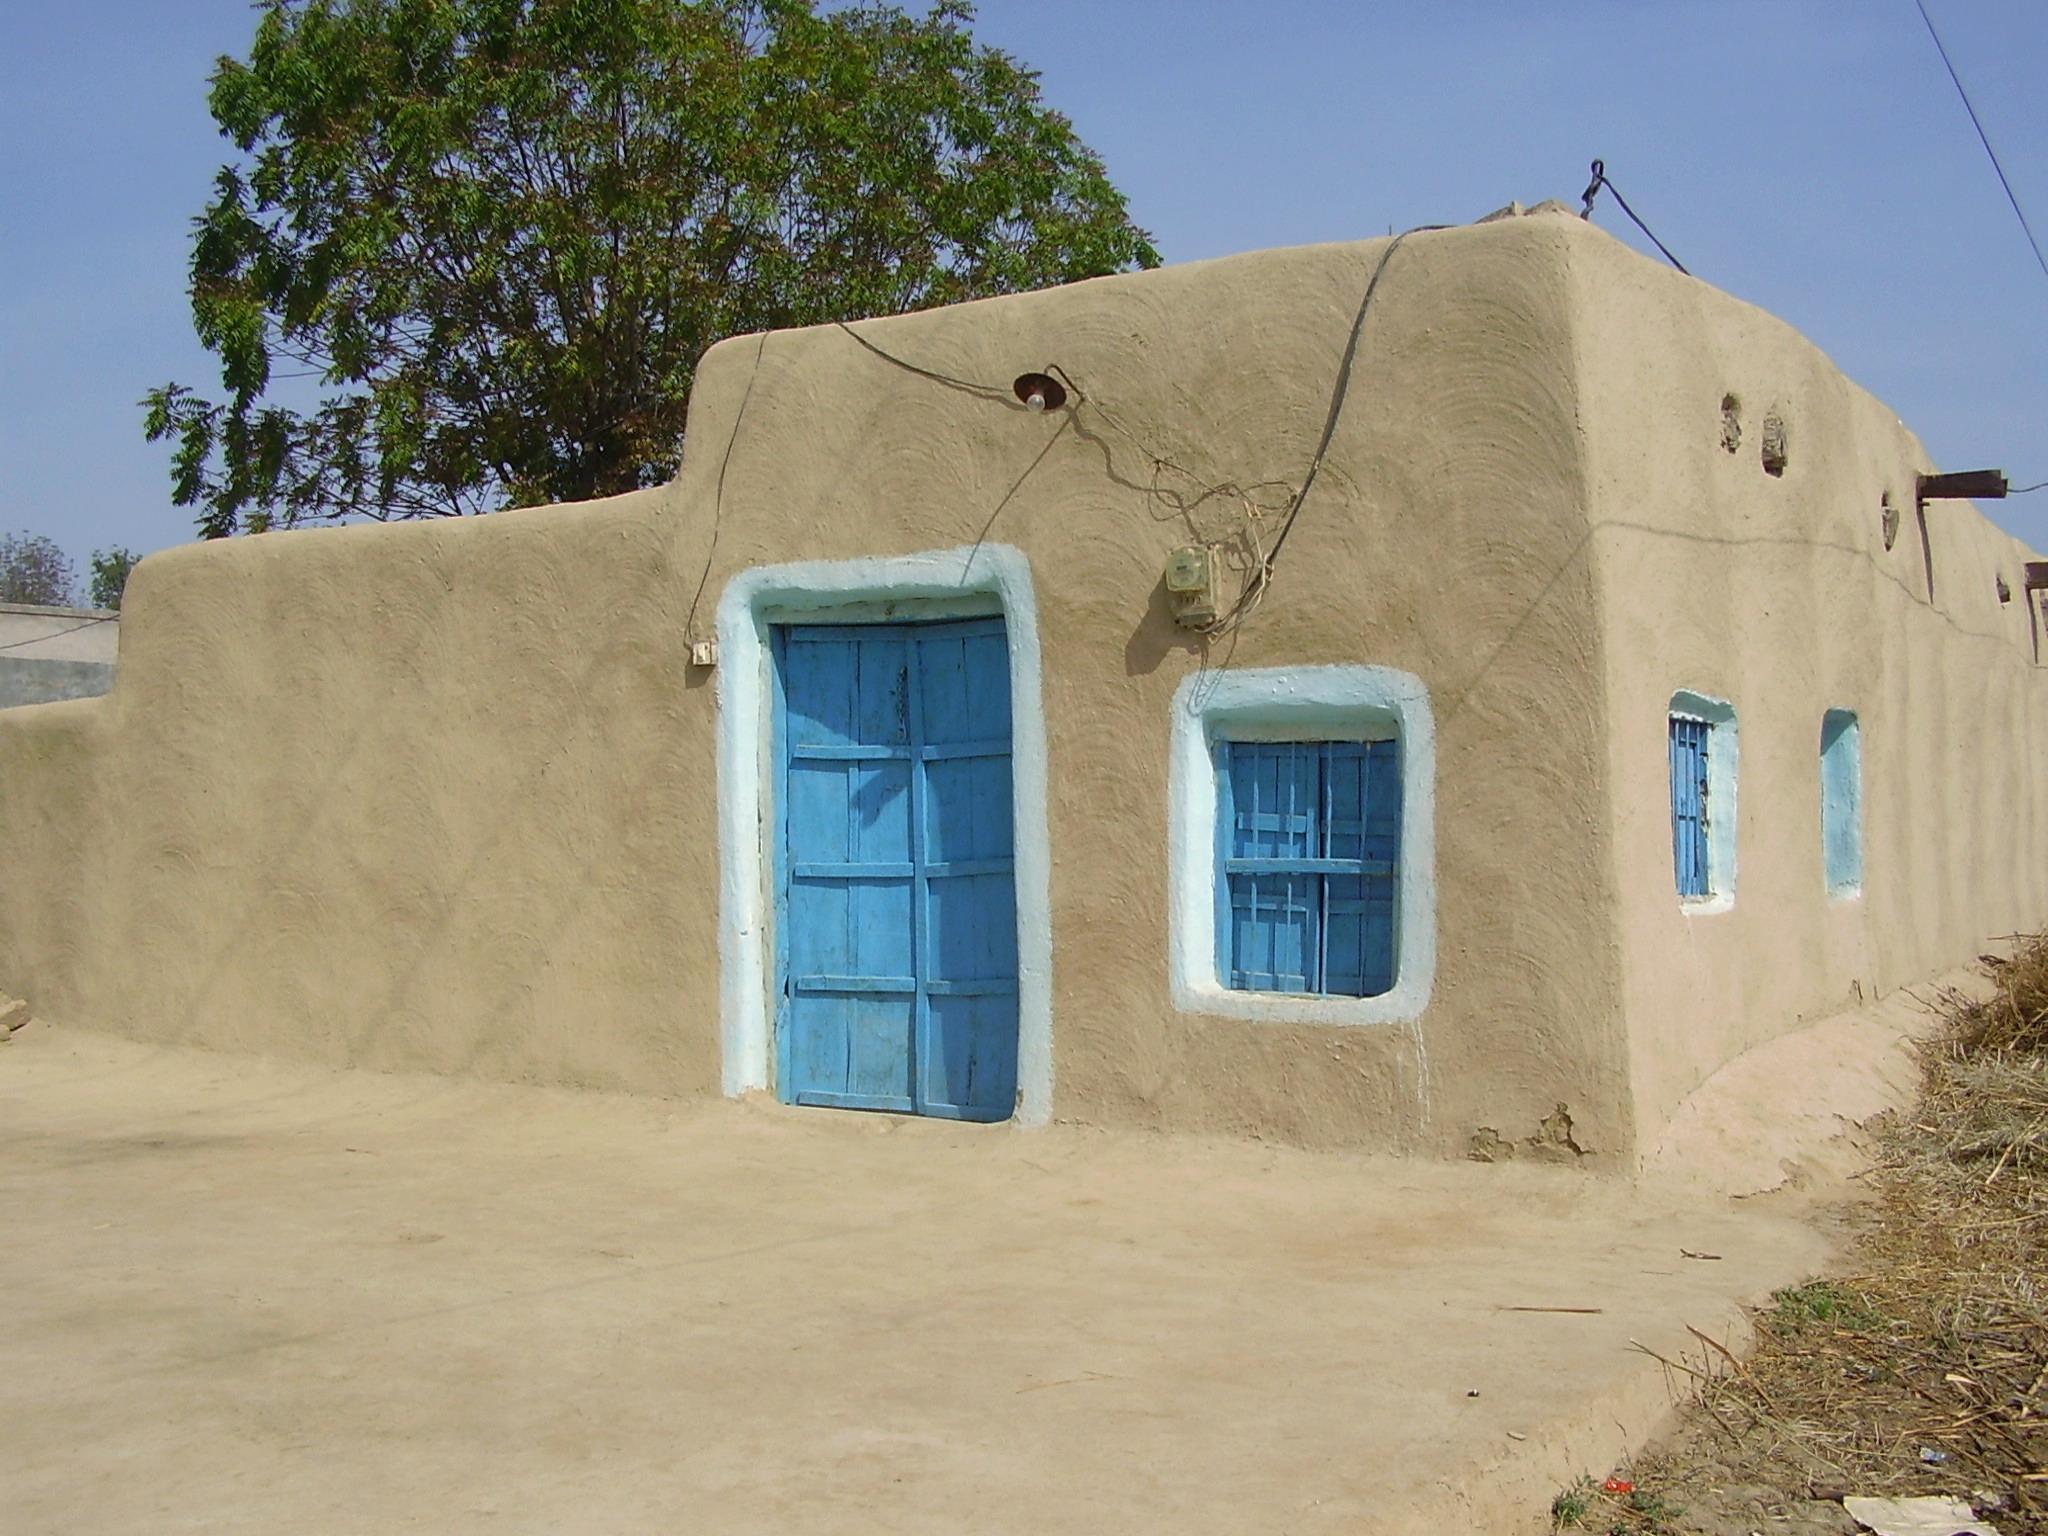 File:Punjabi Home.JPG - Wikimedia Commons